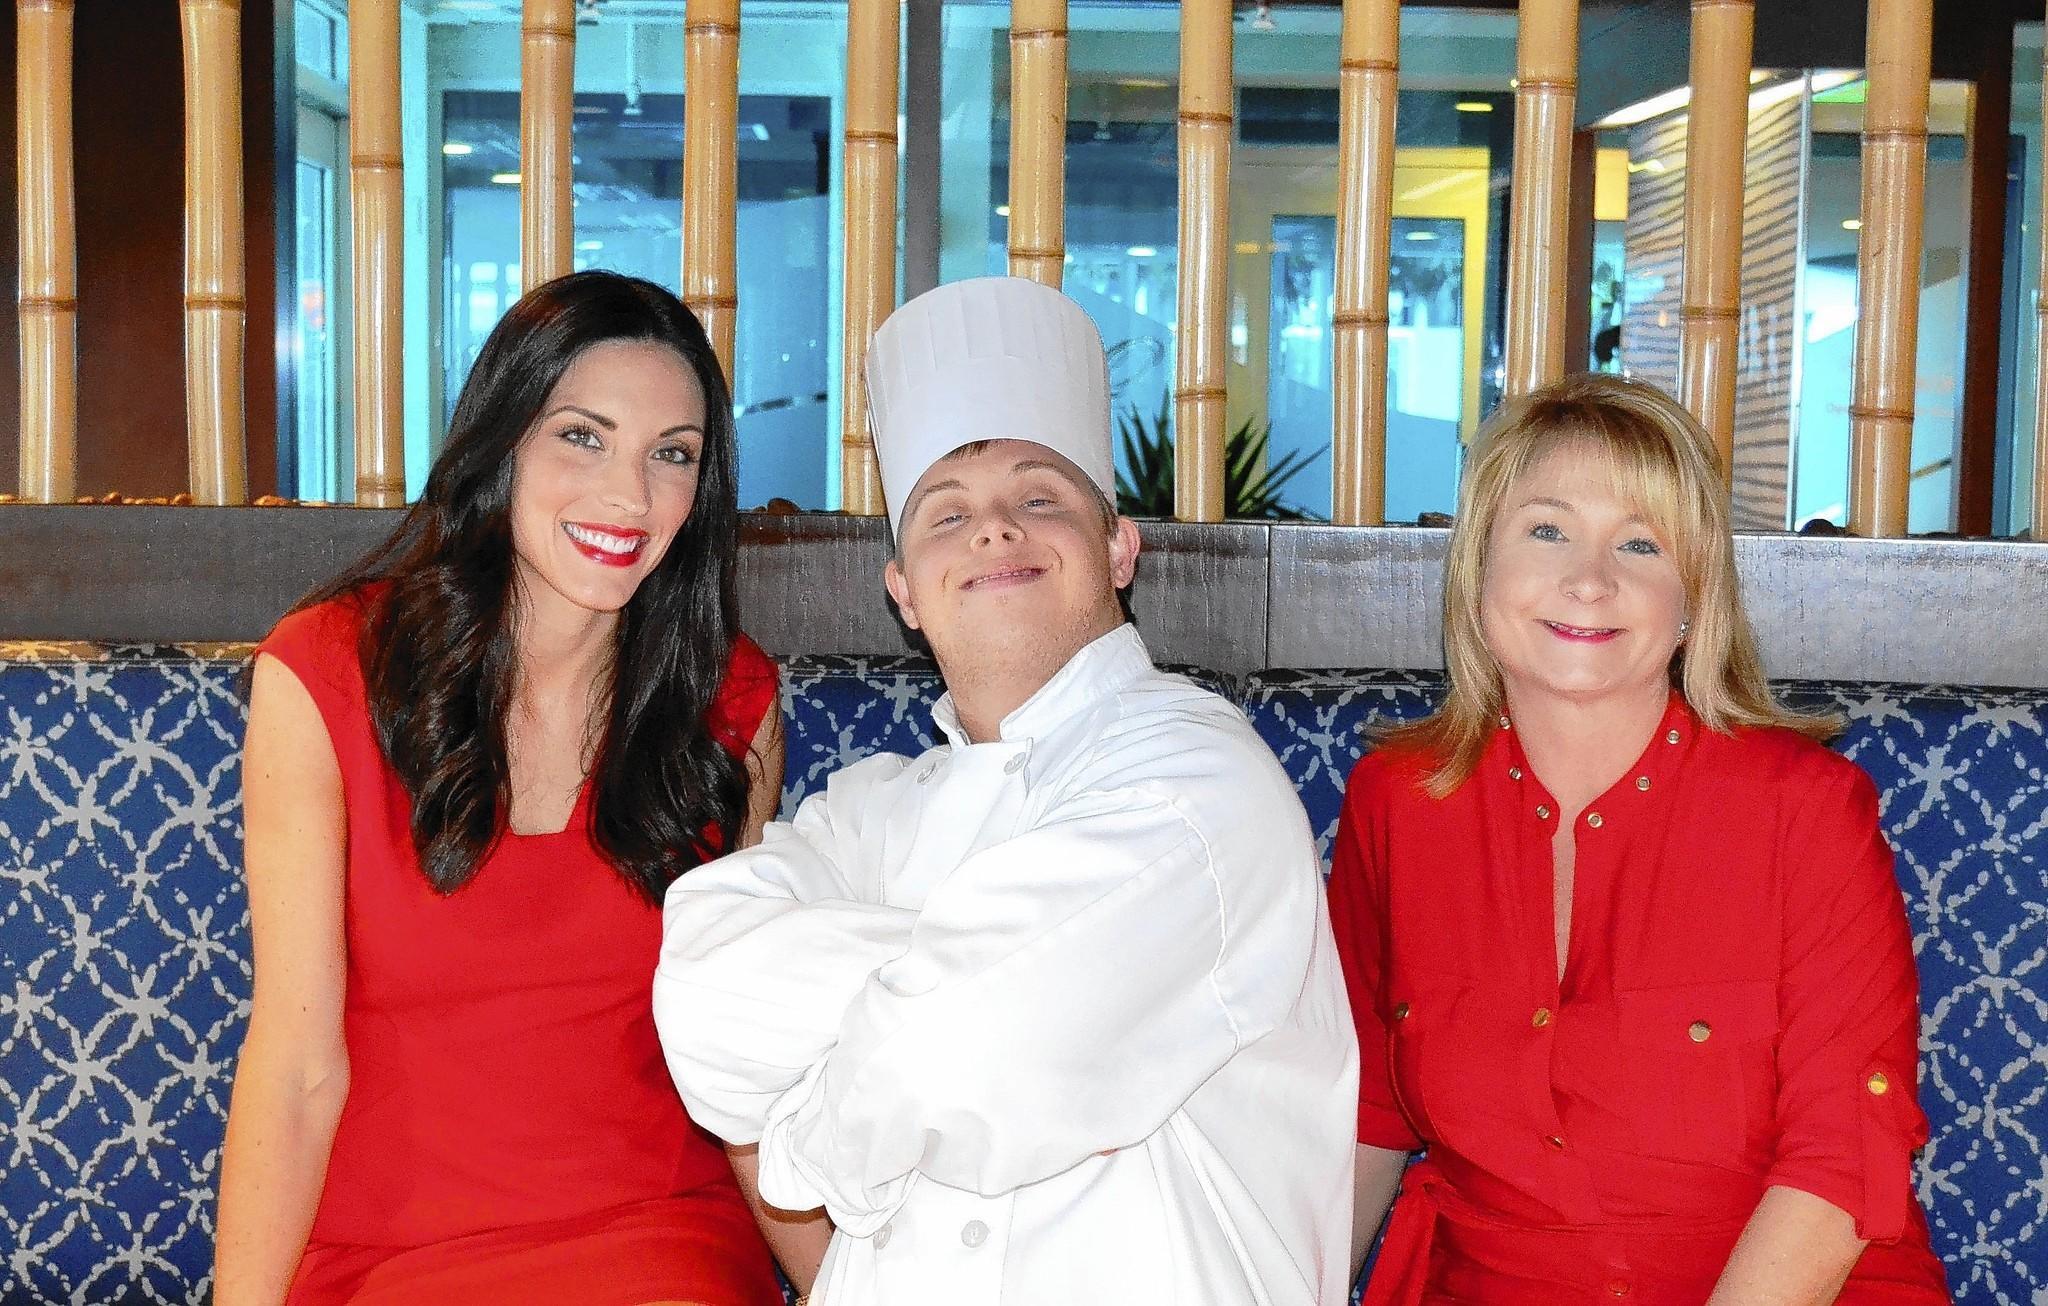 Elizabeth Crowley, left, student chef Dean Bergman and Lori Kennedy